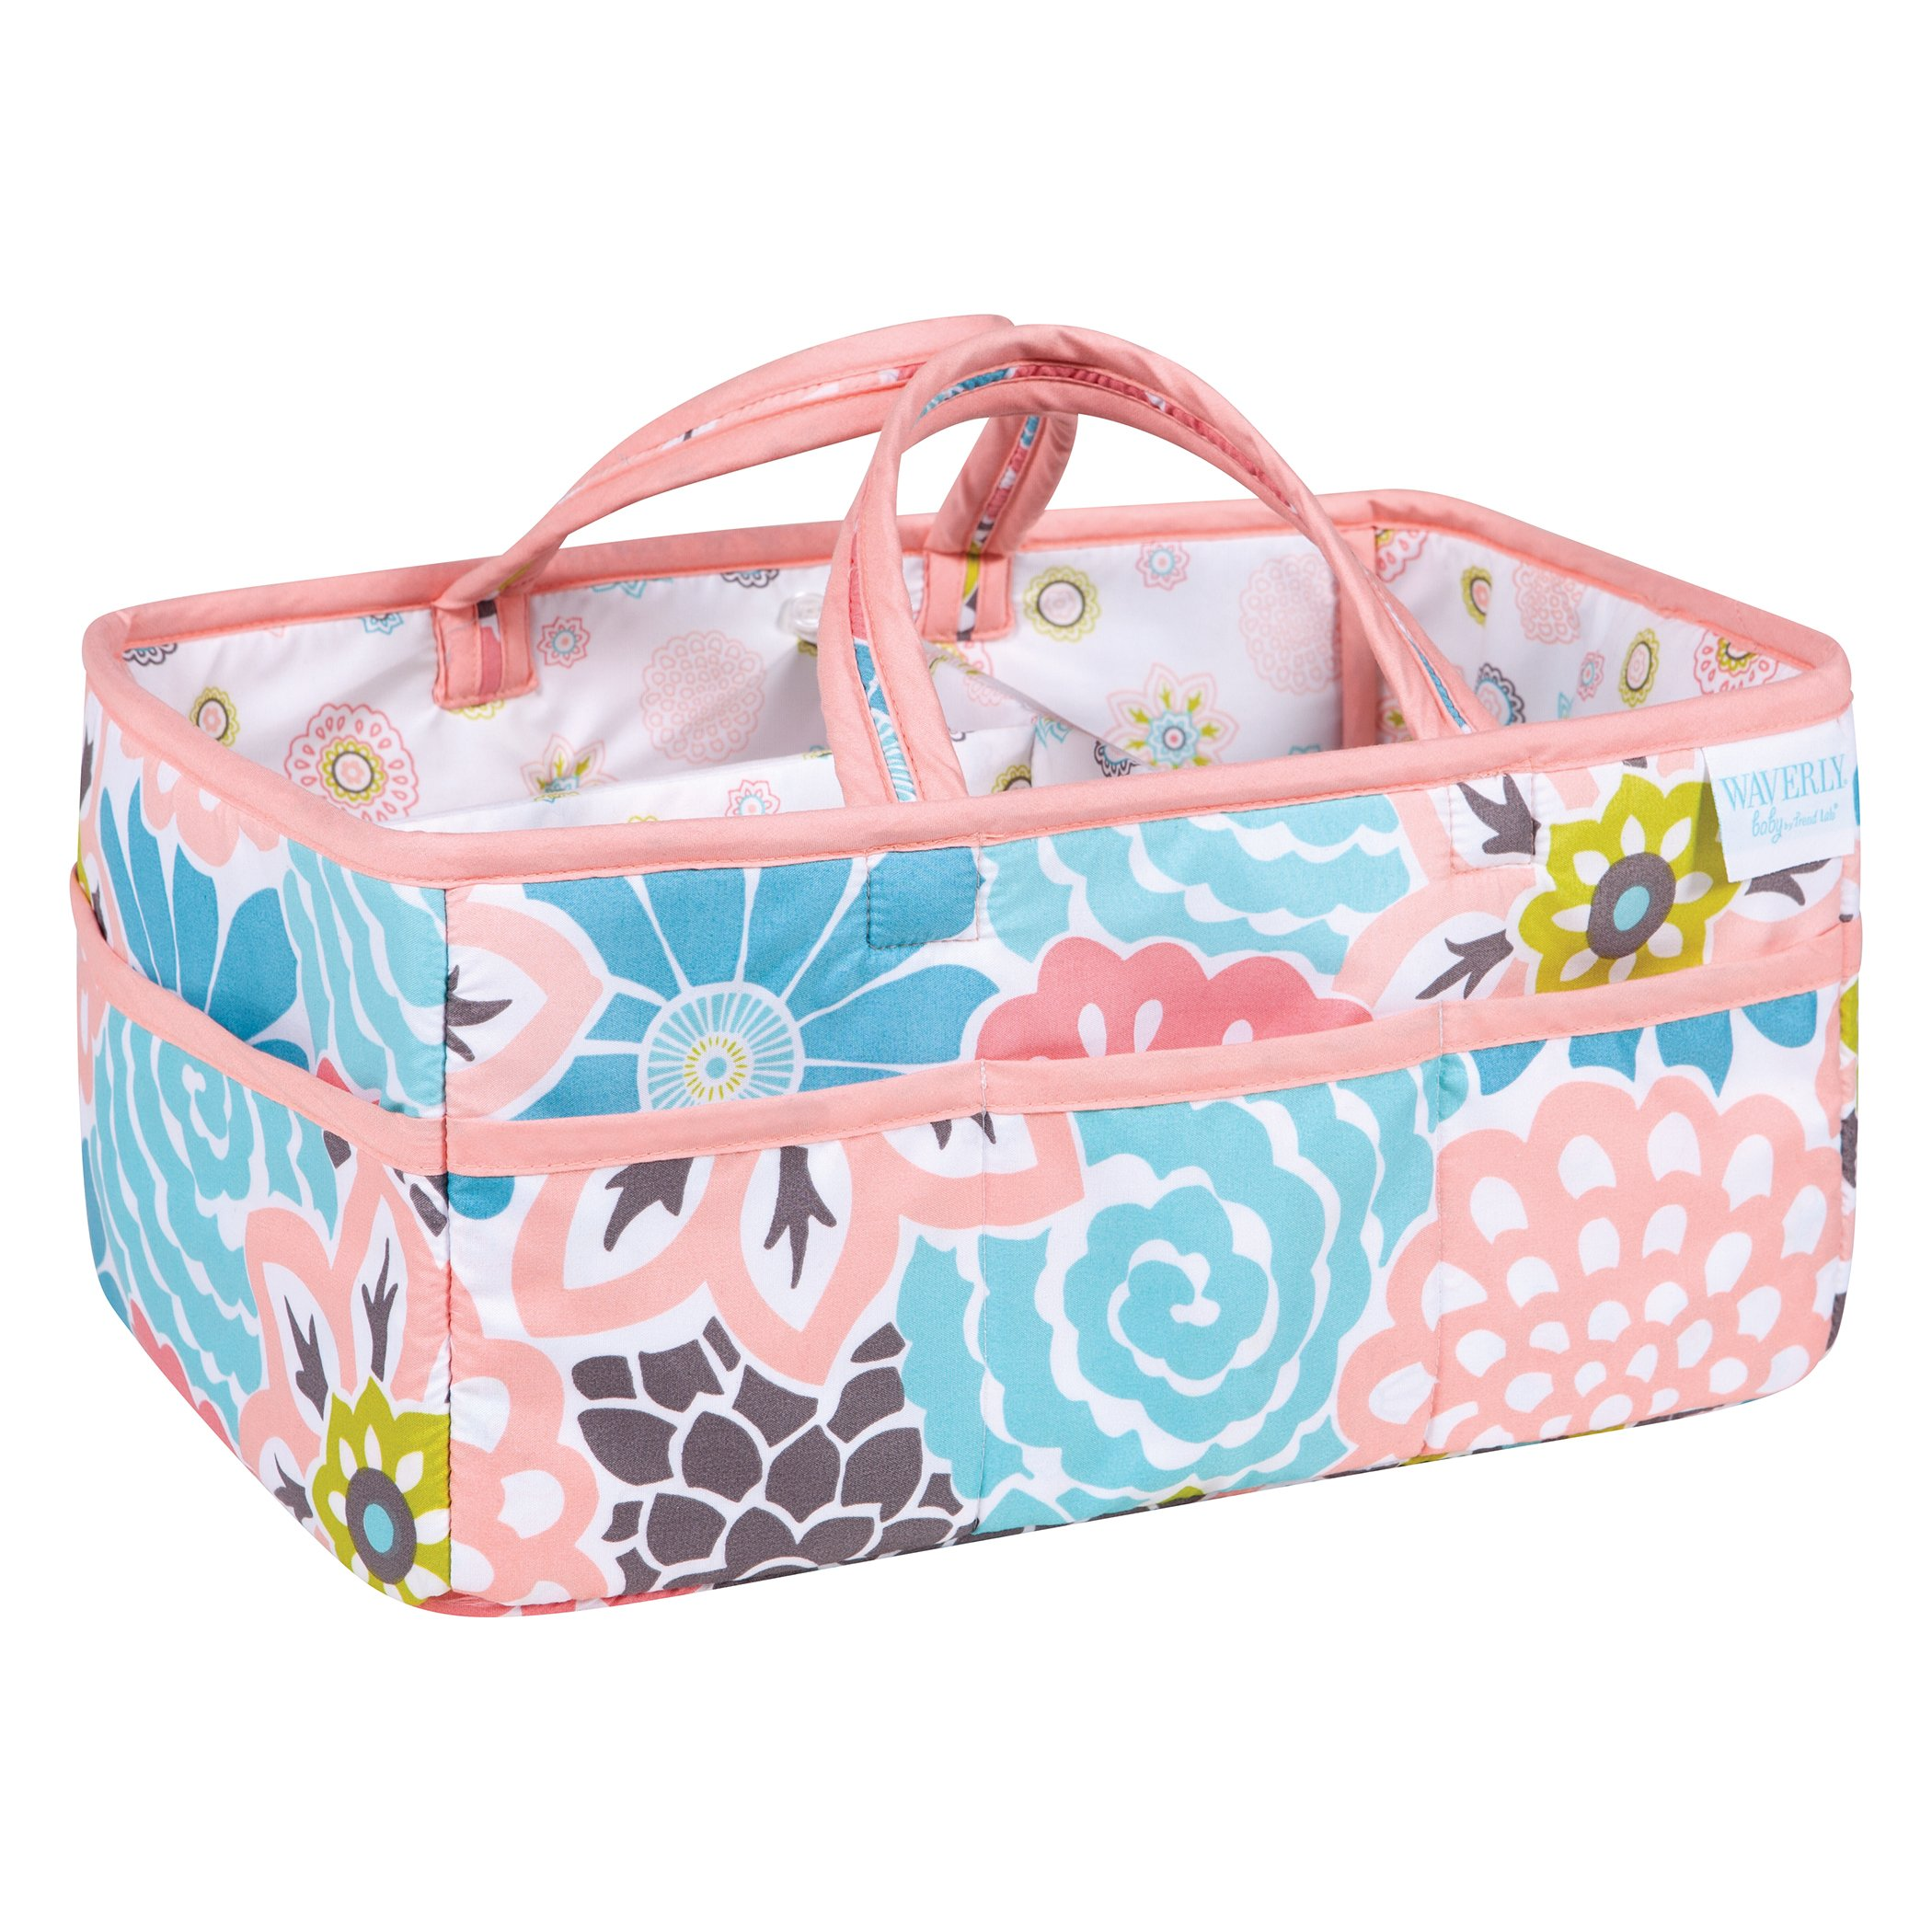 Waverly Blooms by Trend Lab Diaper Caddy, Storage, Bin, Pink